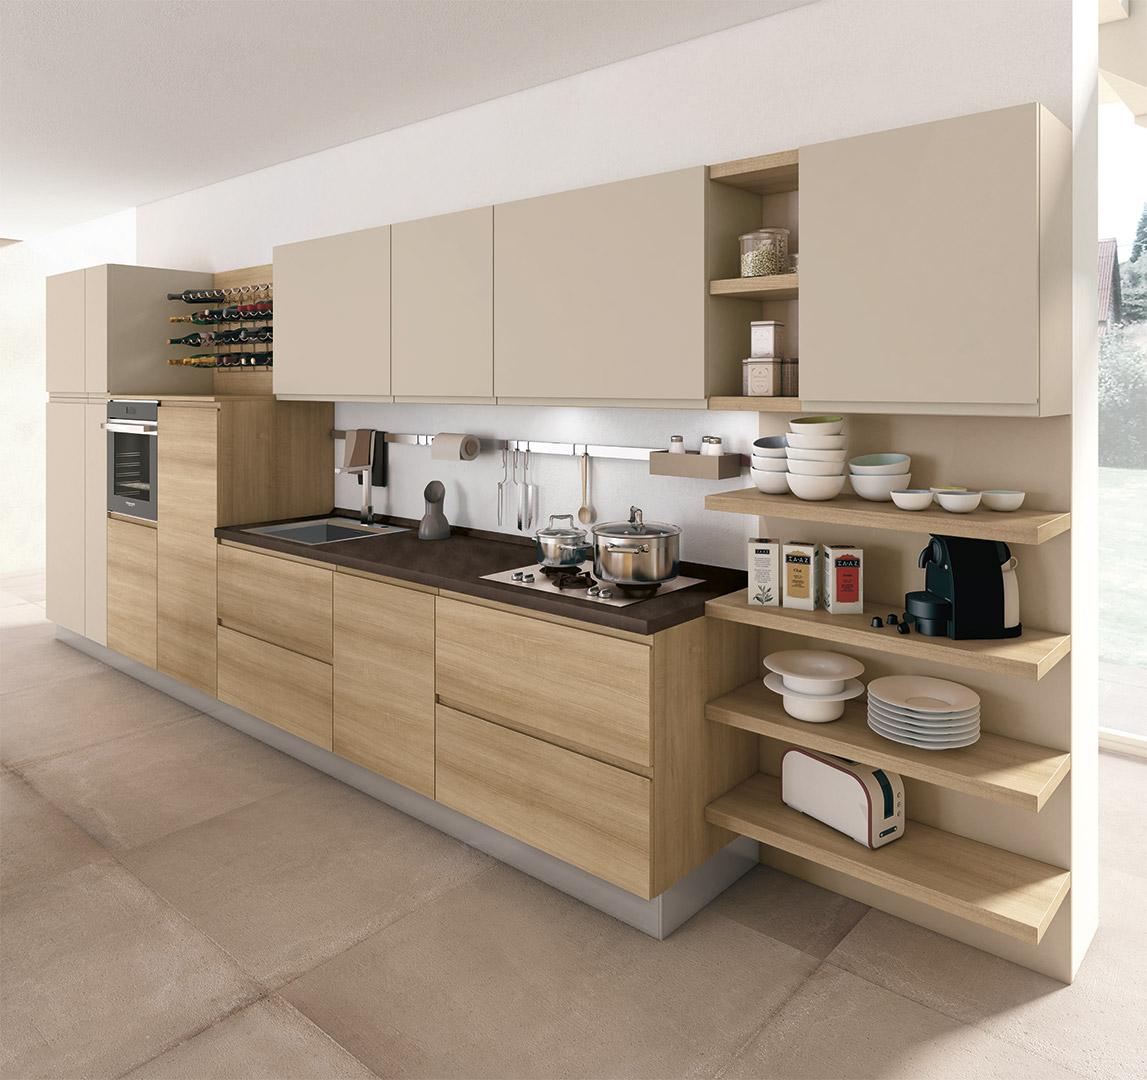 Cucine Creo Lube Opinioni cucina moderna jey - jey creo kitchens